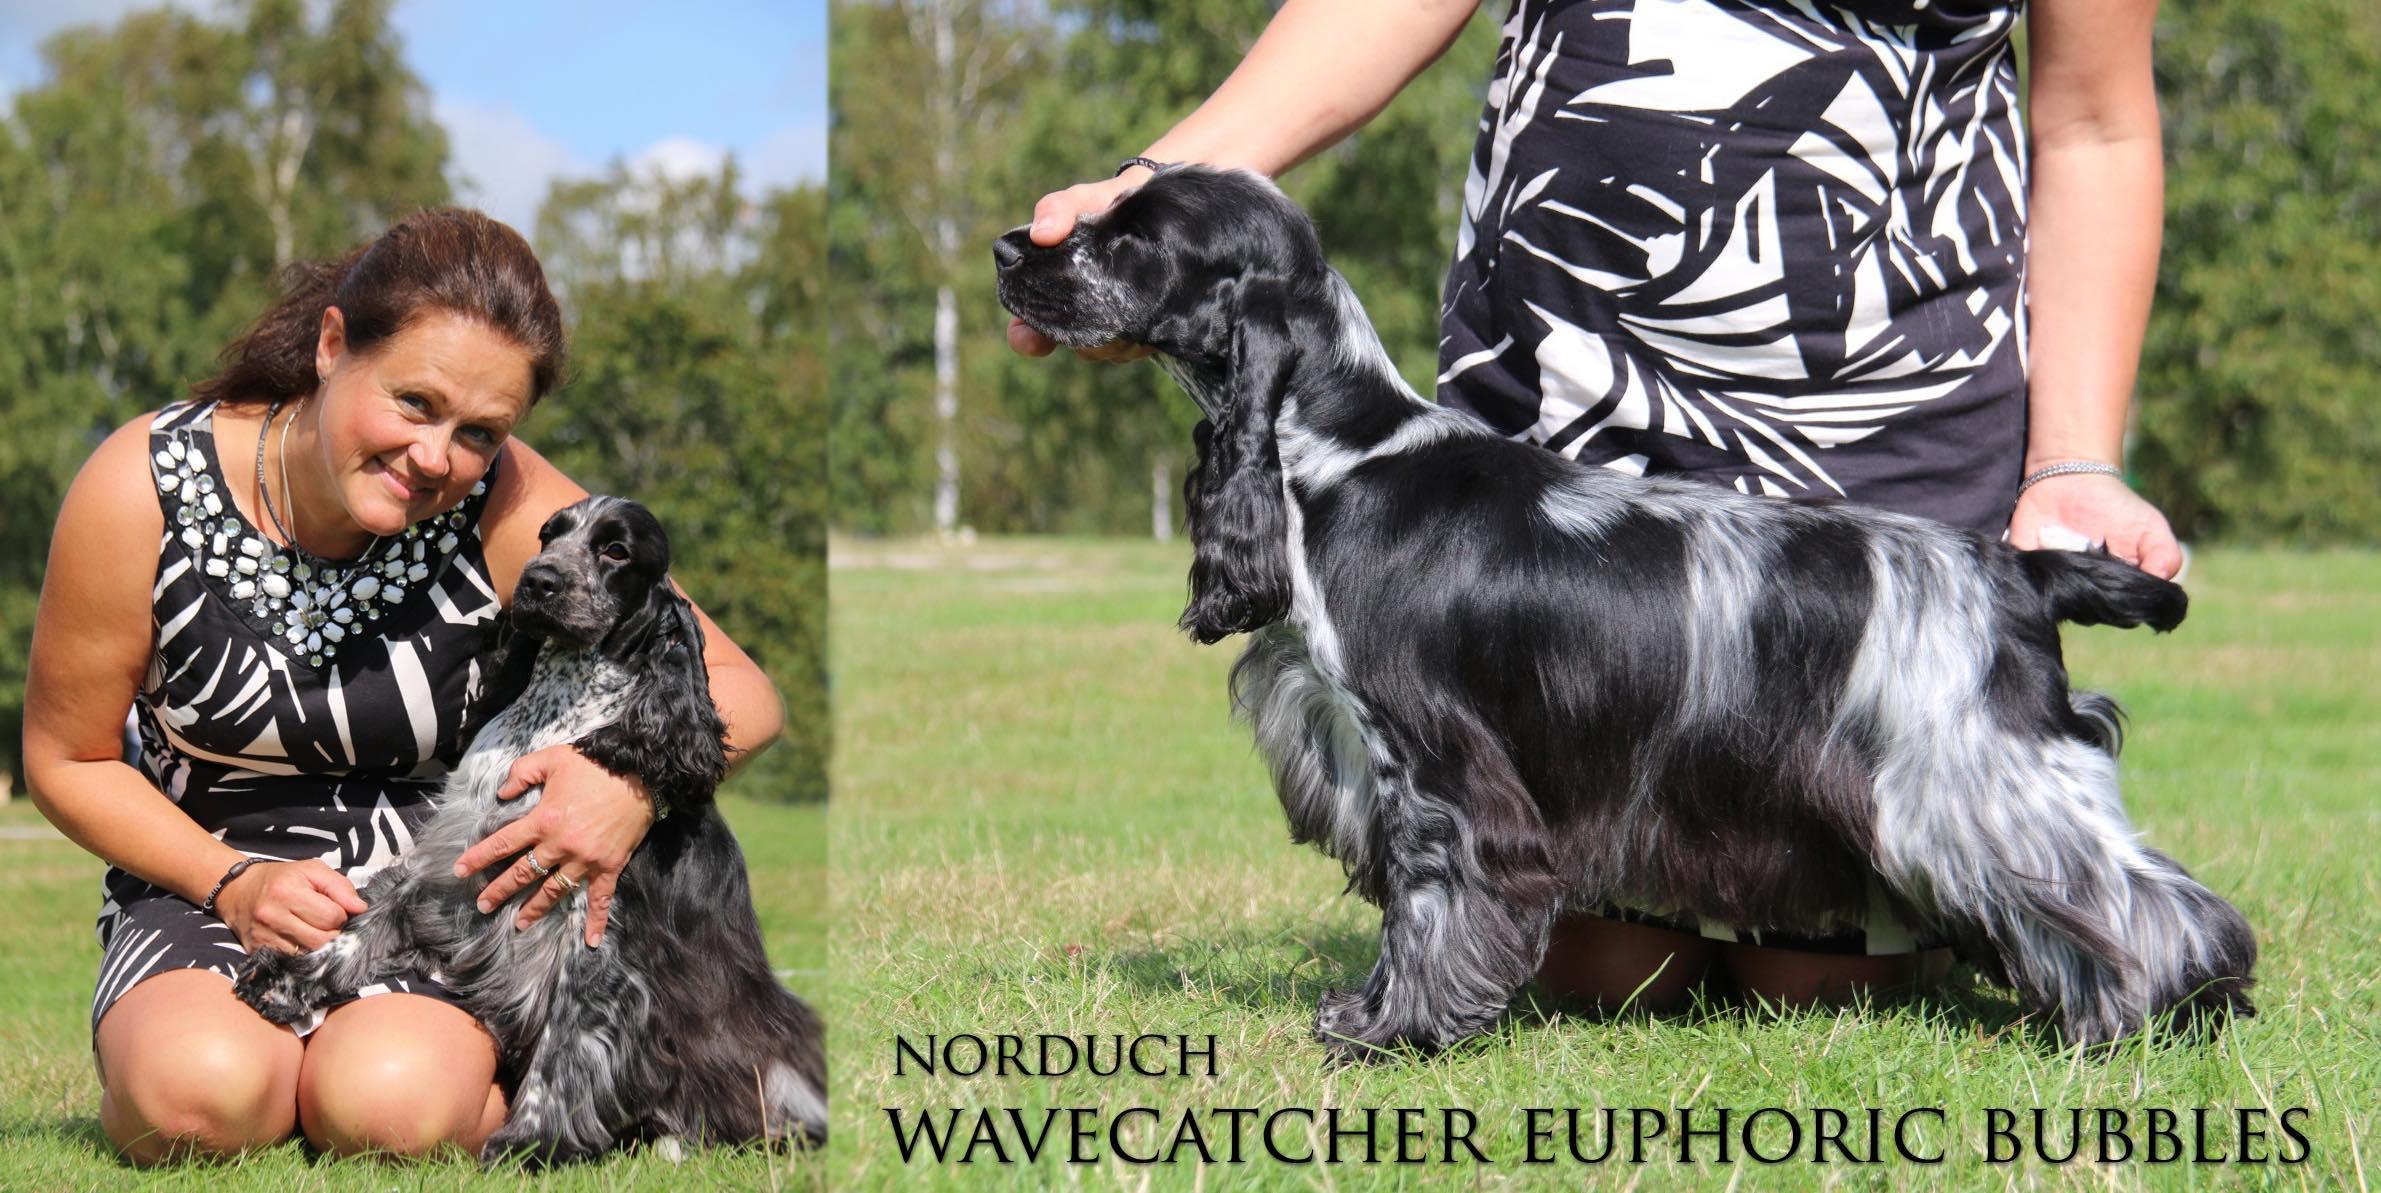 Bianca- SE U(u)CH NOUCH DKUCH NORDUCH Wavecatcher Euphoric Bubbles ÅRETS COCKER 2018